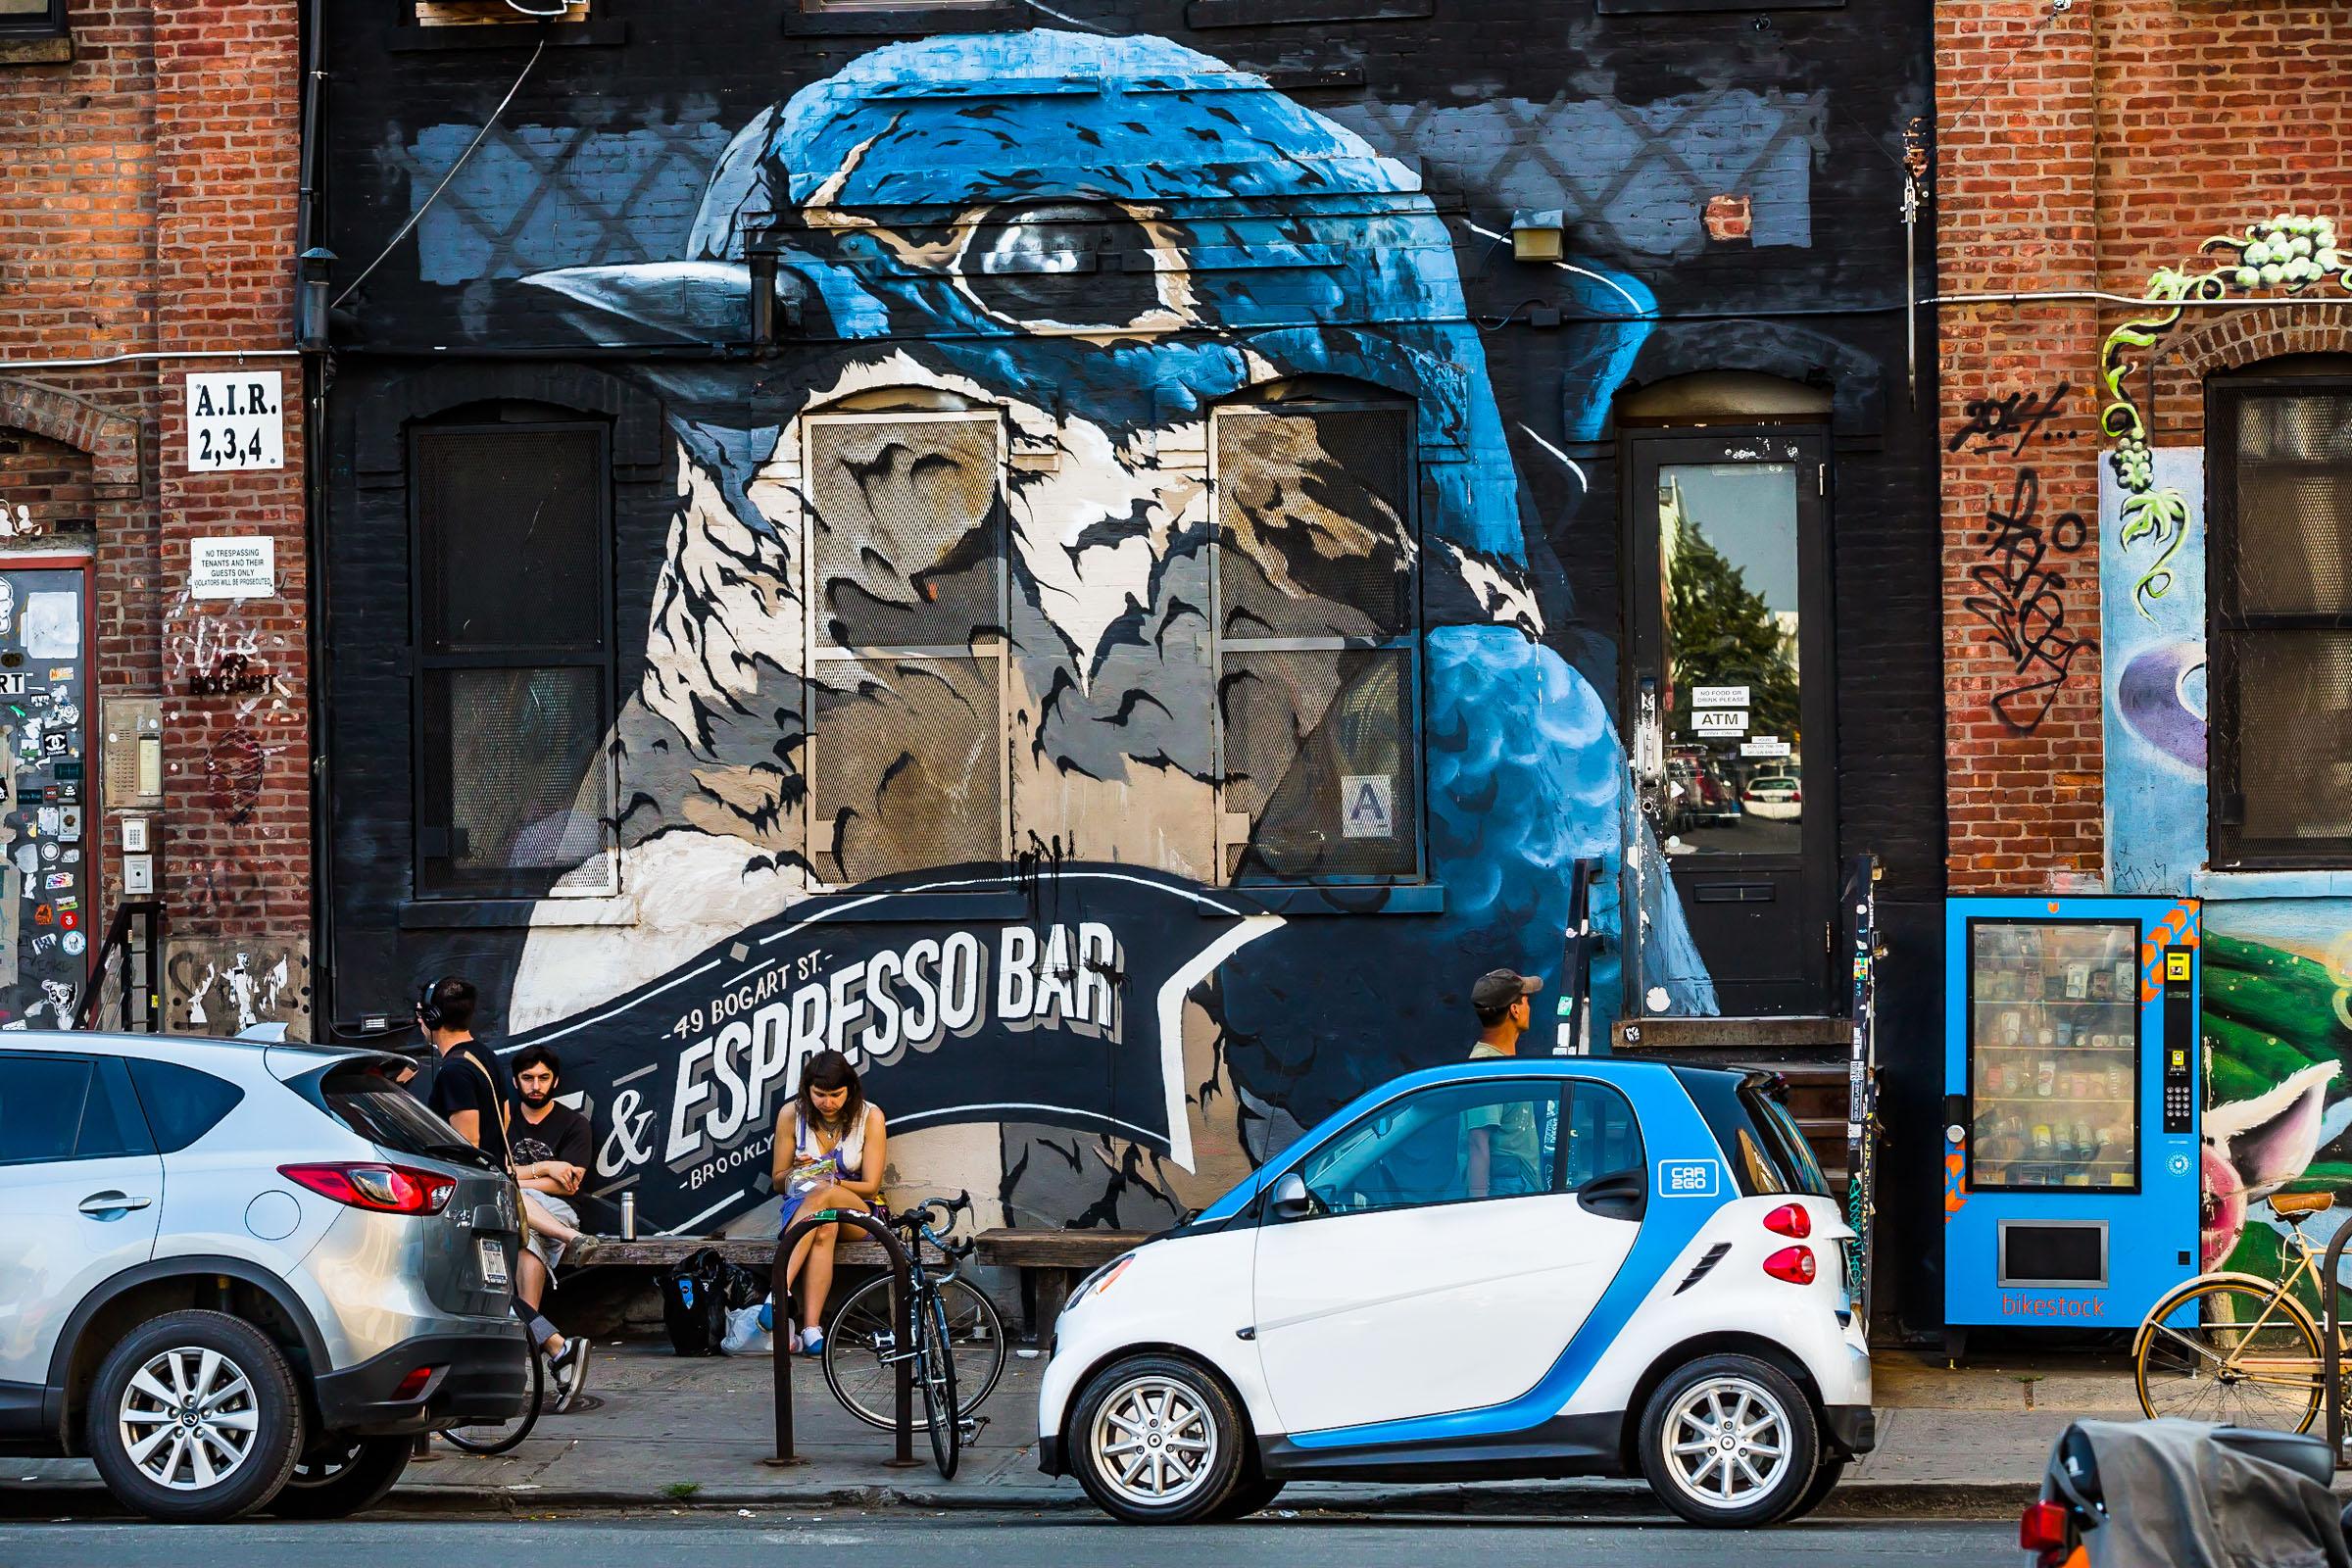 Car2go local marketing campaign. Brooklyn, NY